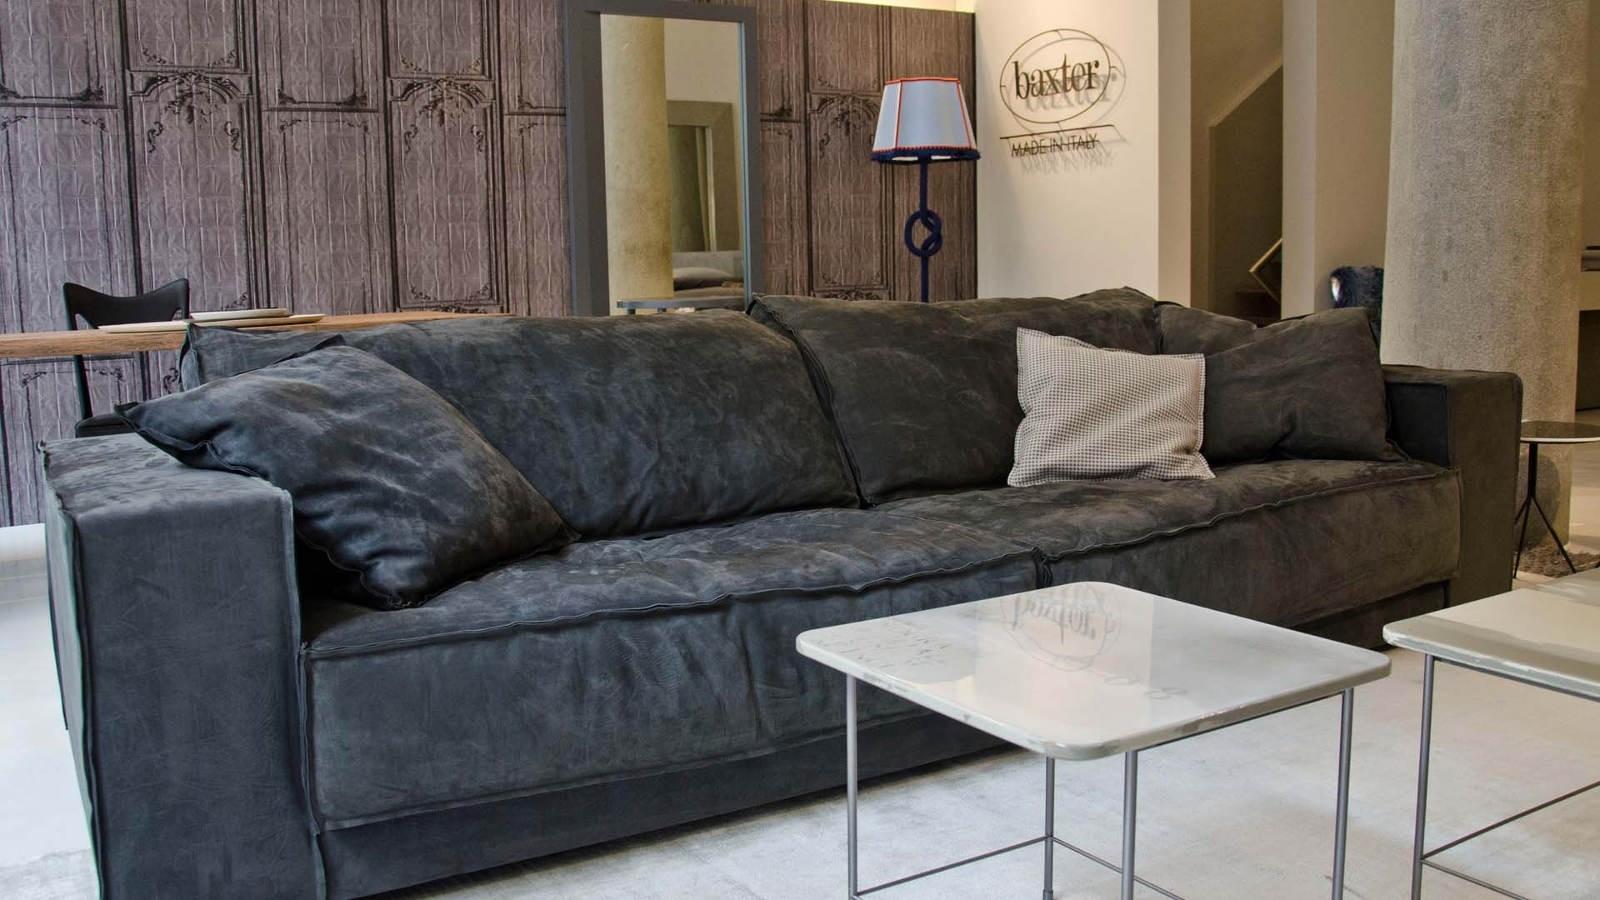 budapest divano baxter acquista online